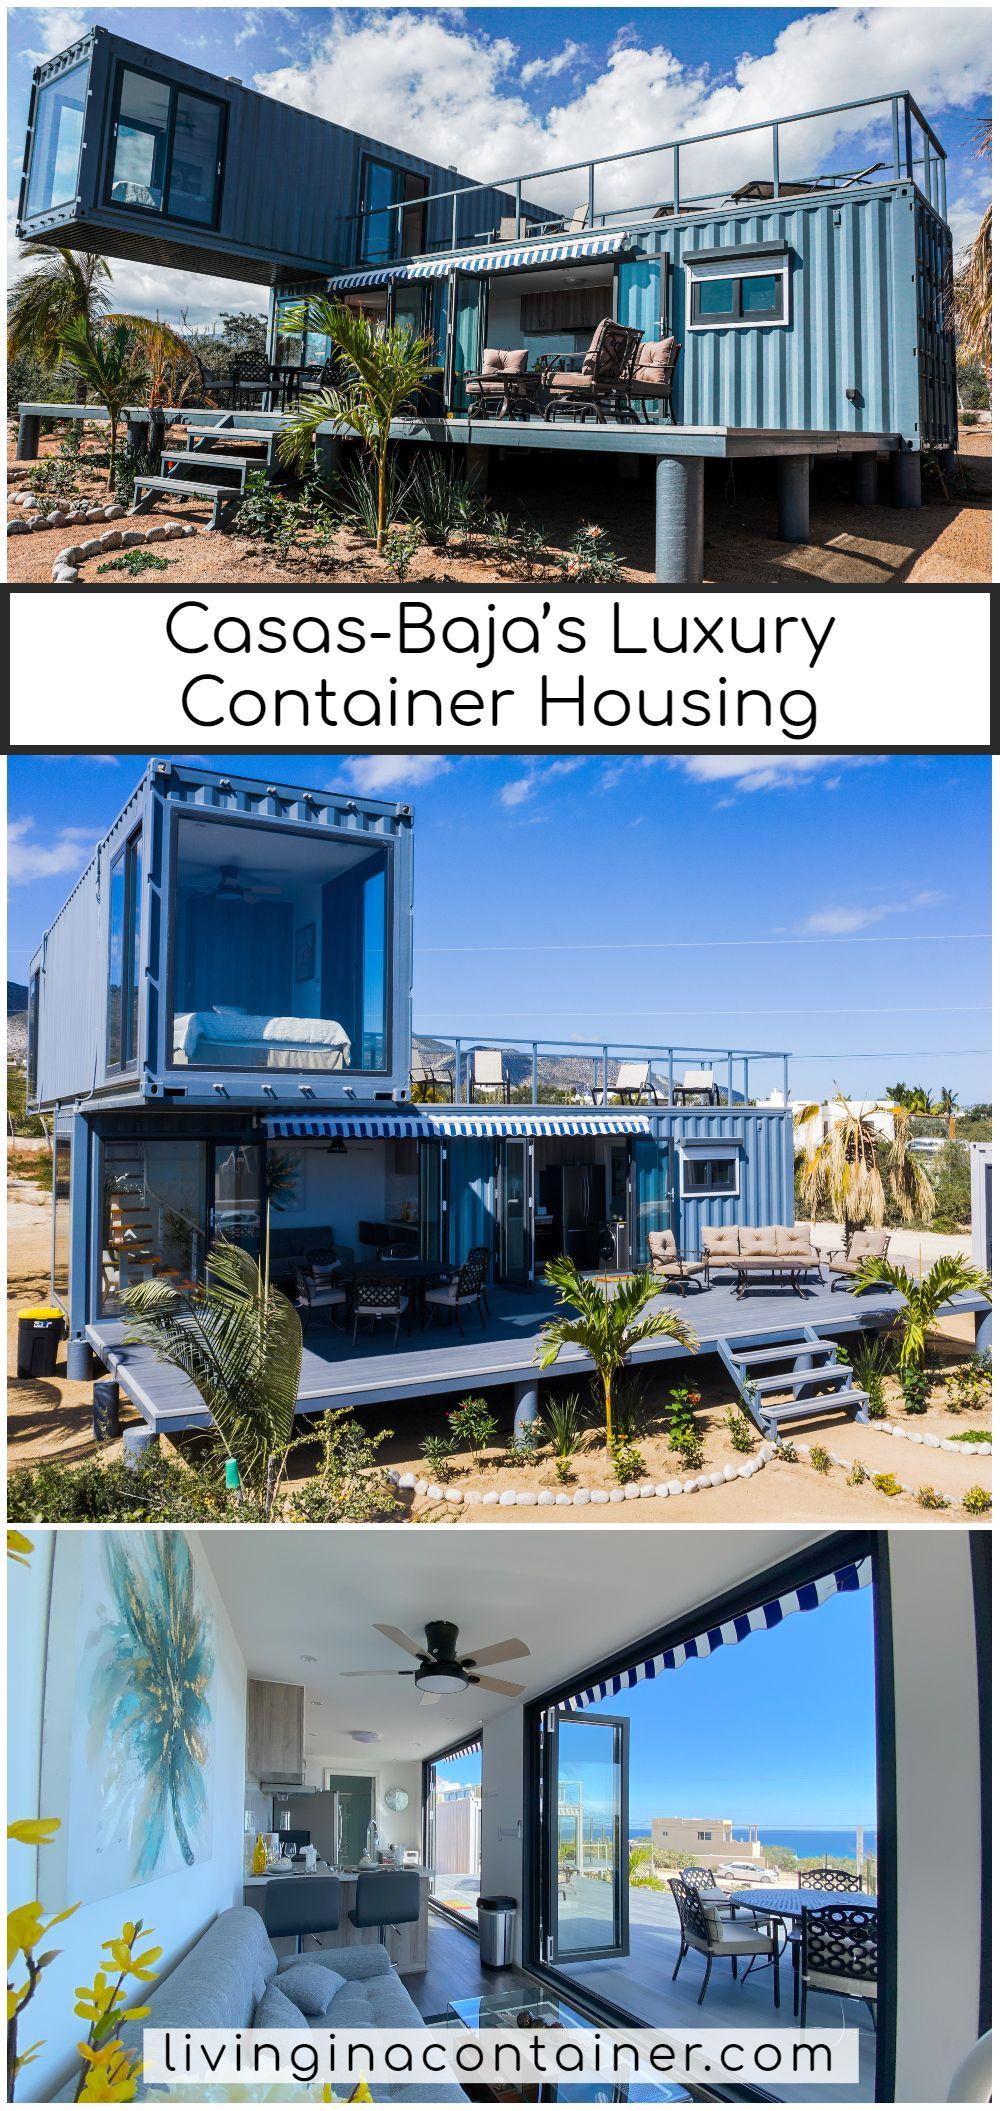 Casas-Baja's Luxury Container Housing